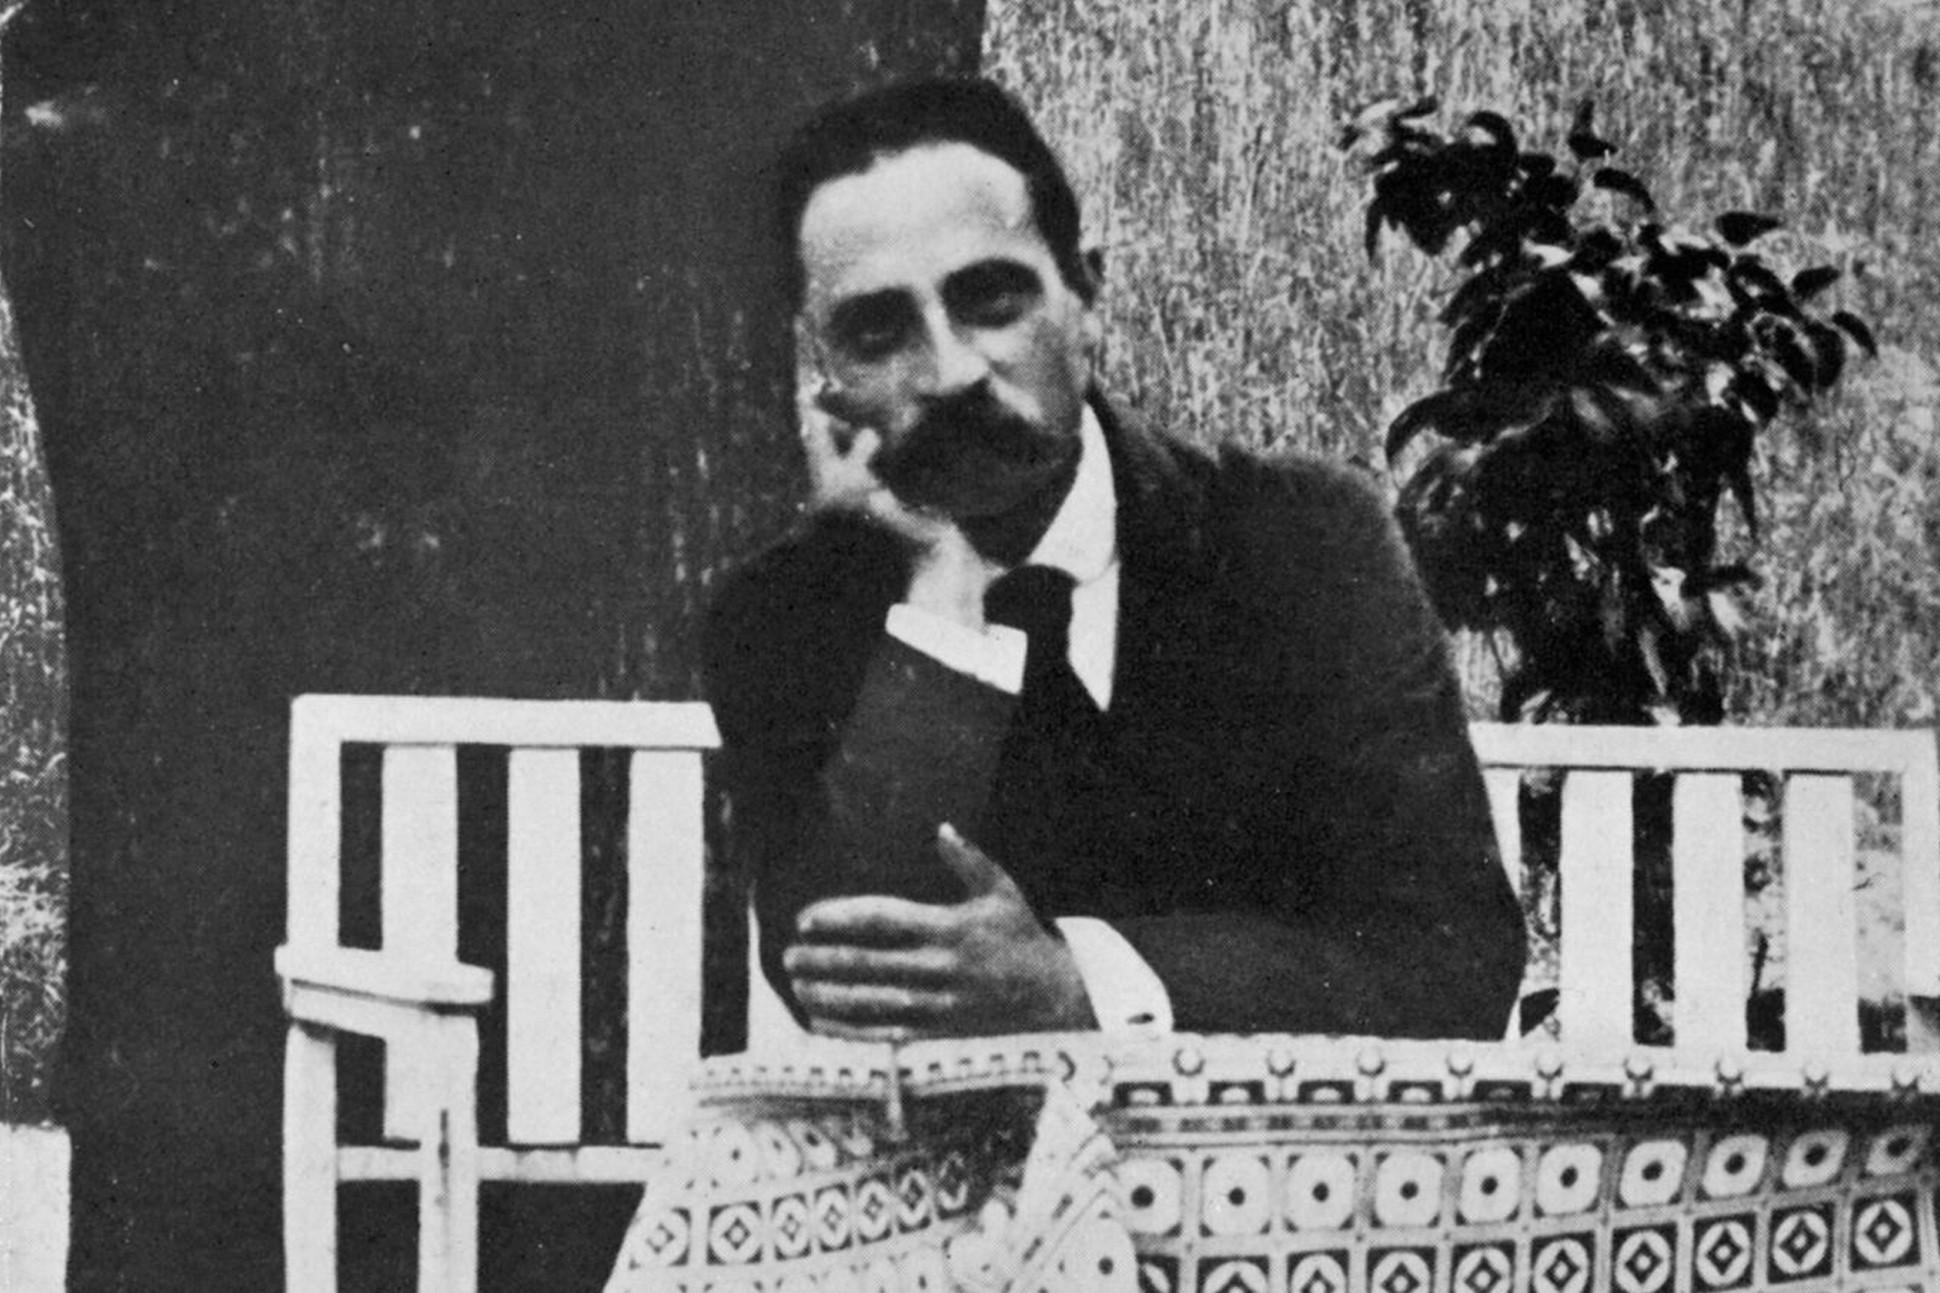 Black and white photograph of Rainer Maria Rilke